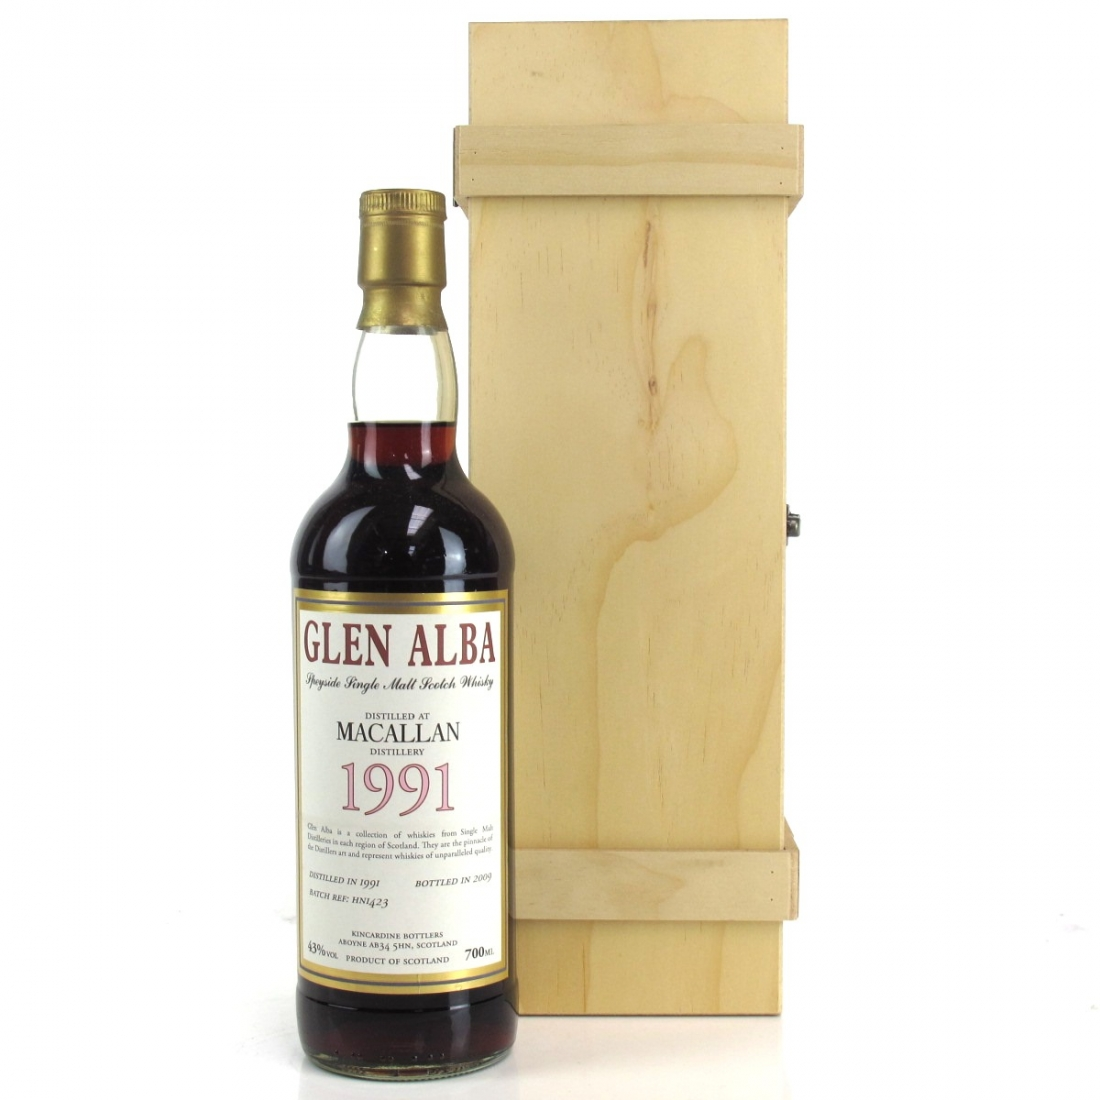 Macallan 1991 Glen Alba